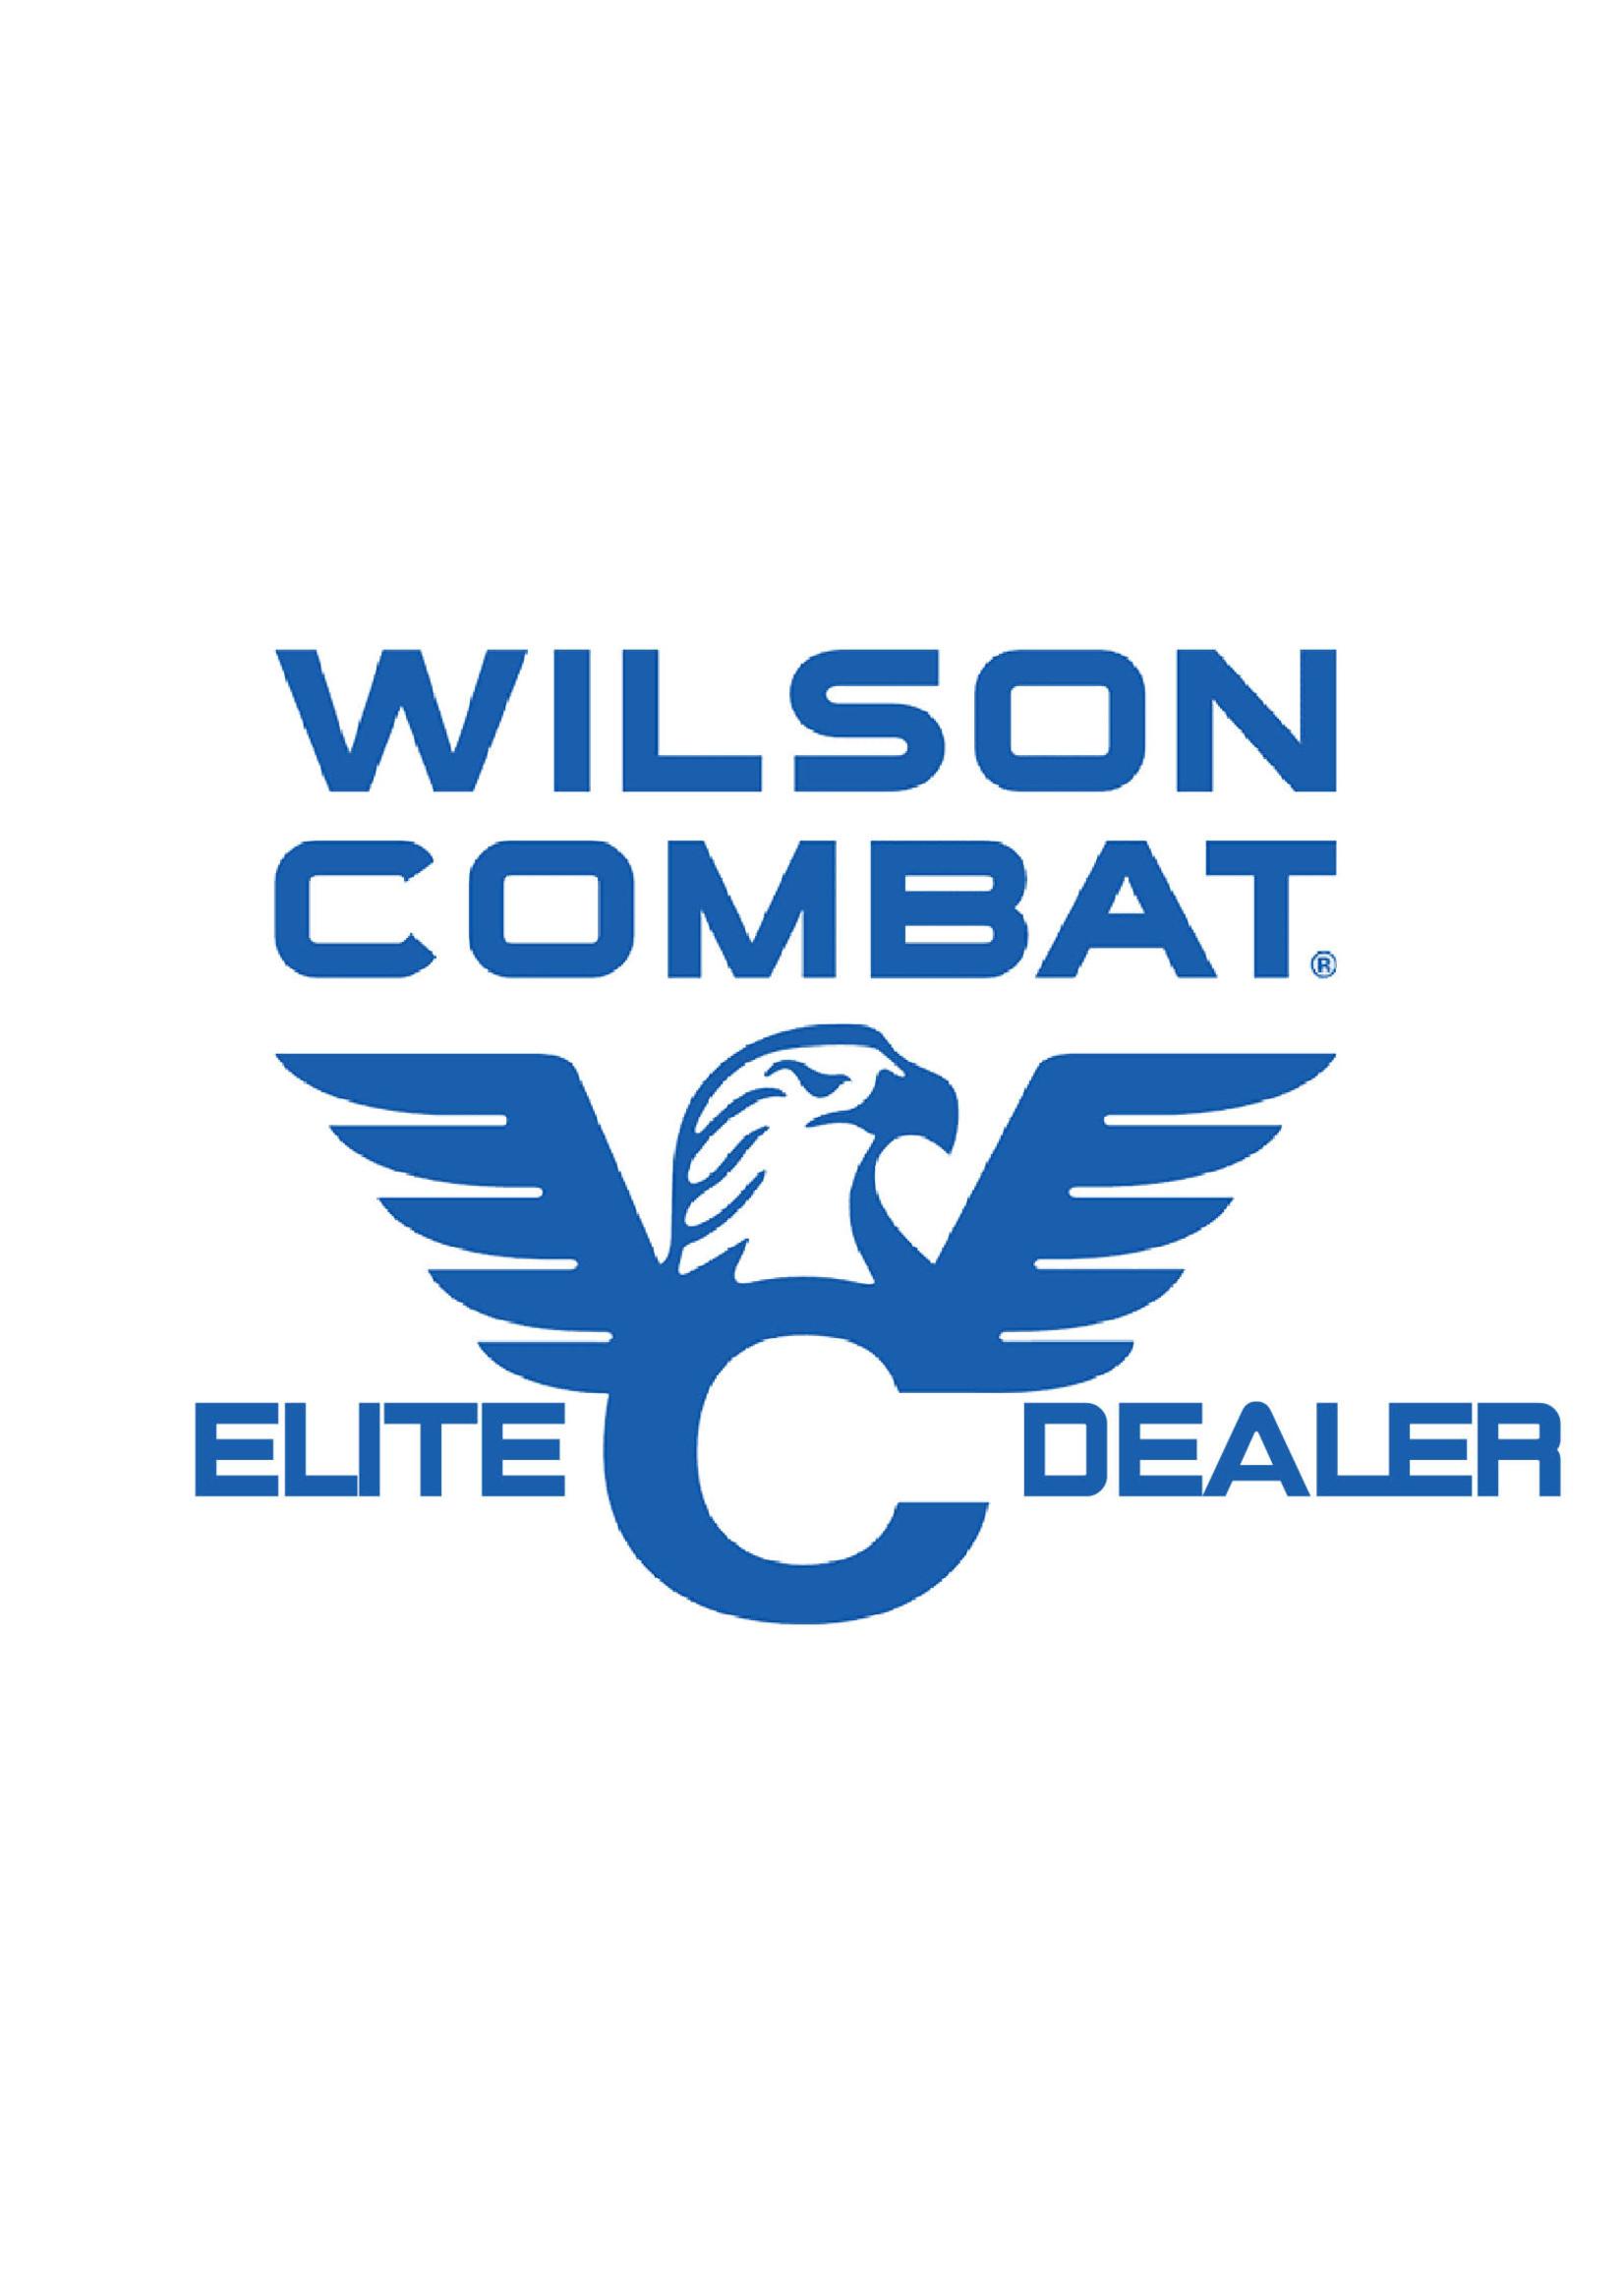 WILSON COMBAT EDC X9L w/Experior Frame, Optic Cut, DT Black Edition, 9mm, Lightrail, Magwell, NS, Ambi